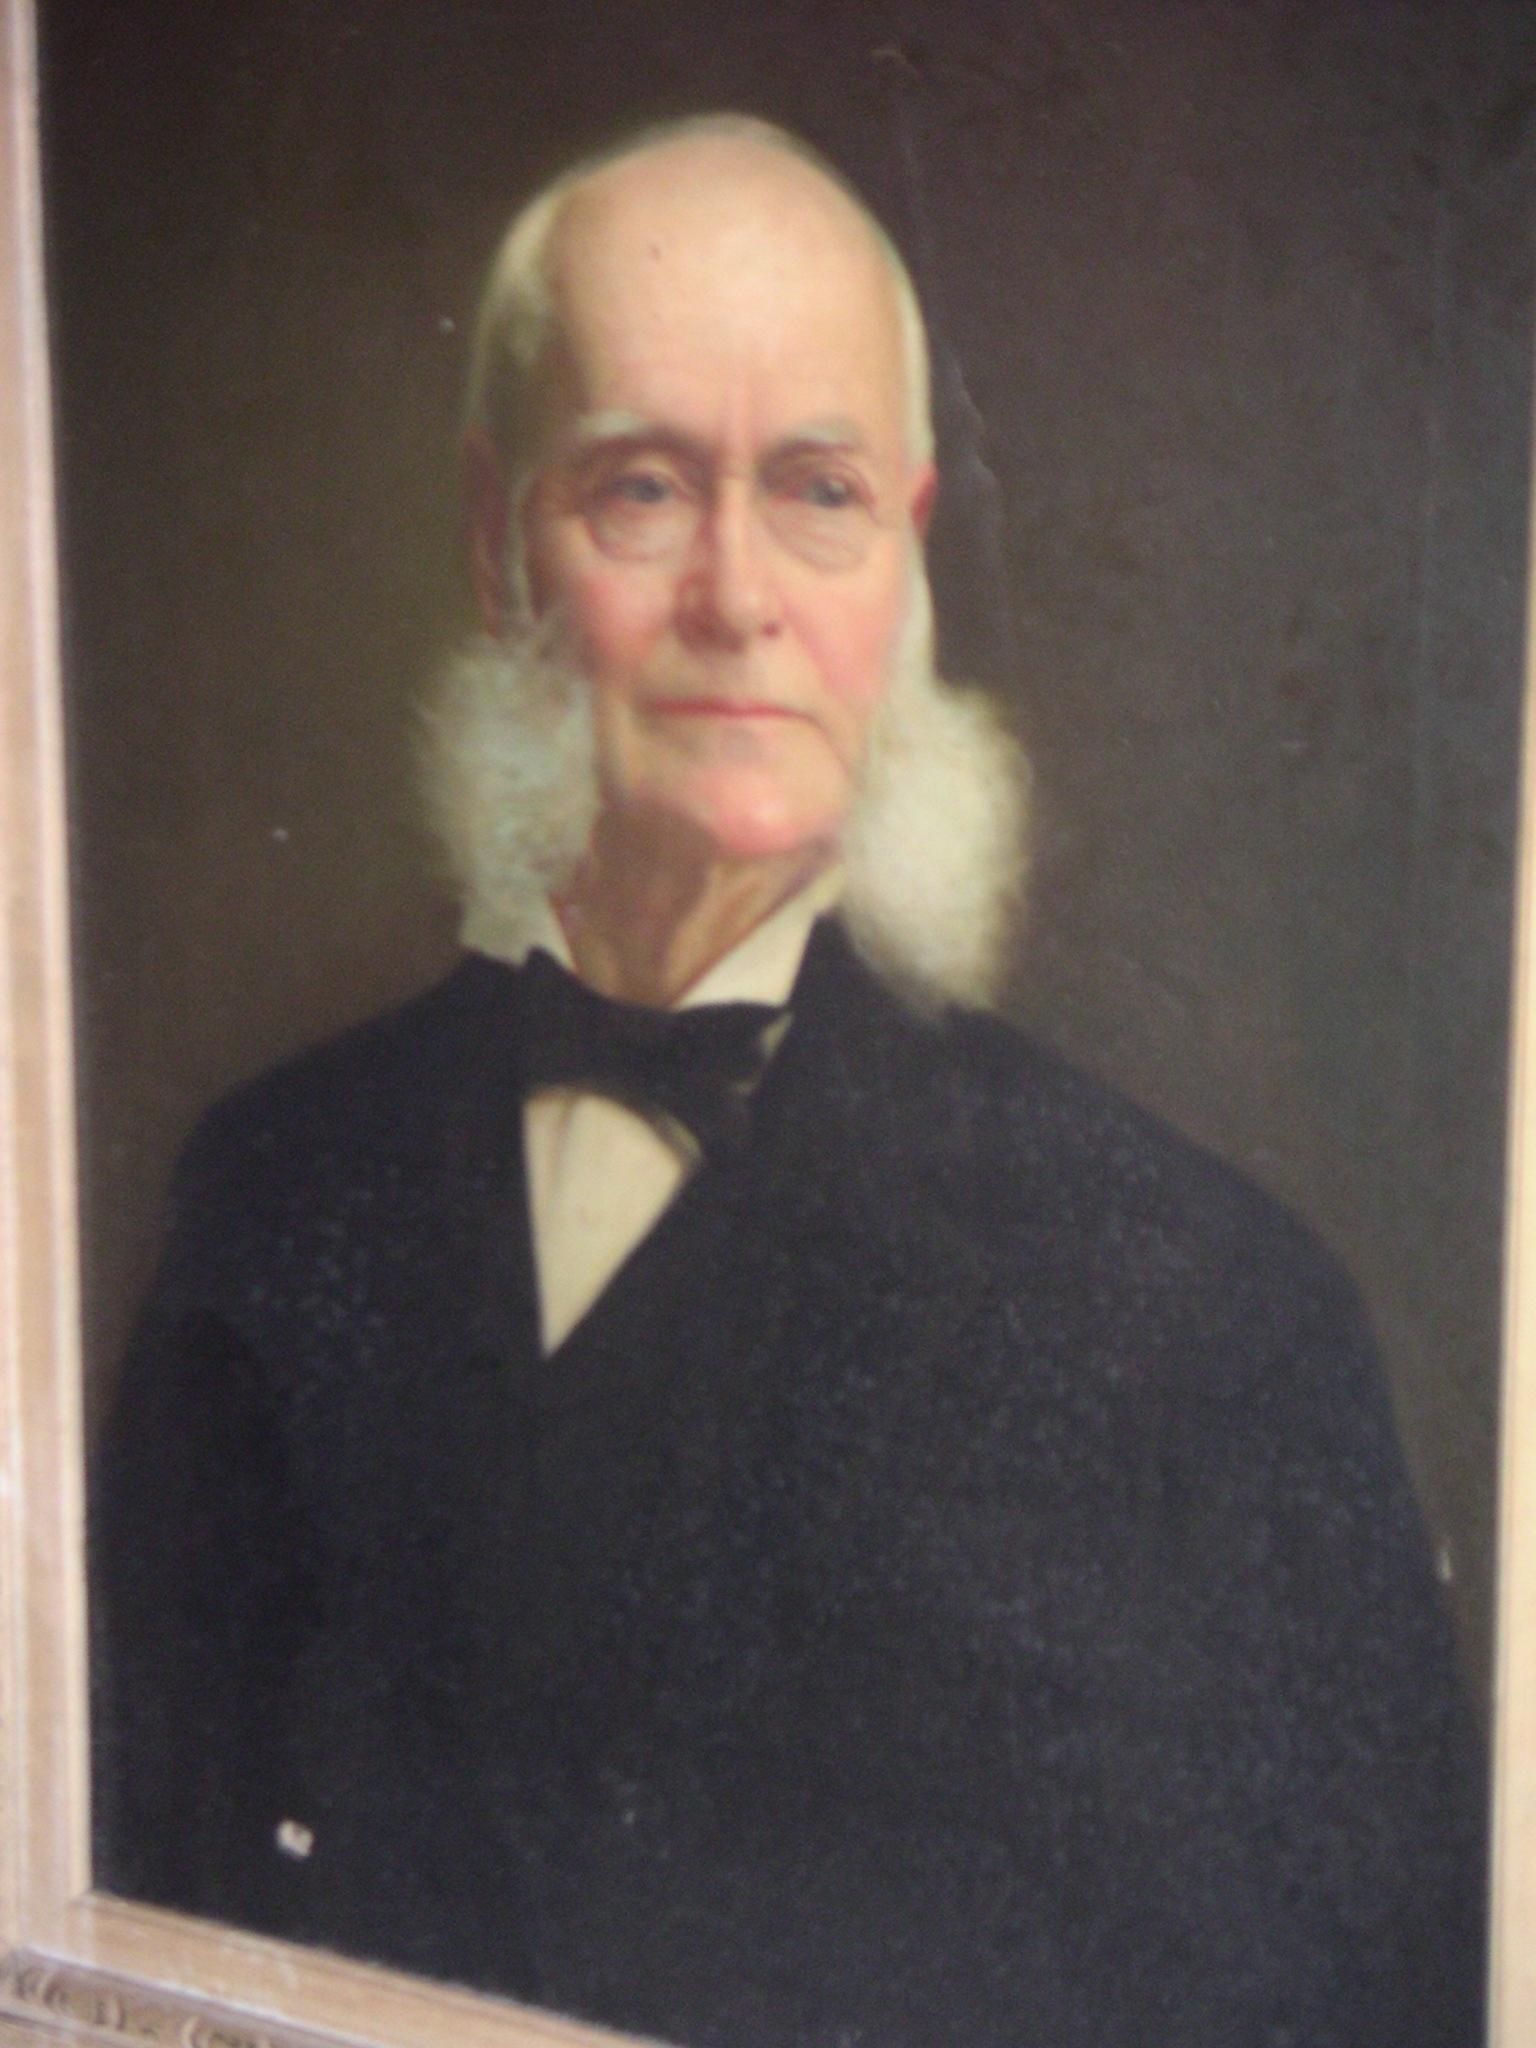 David Hunter Mcalpin Wikipedia